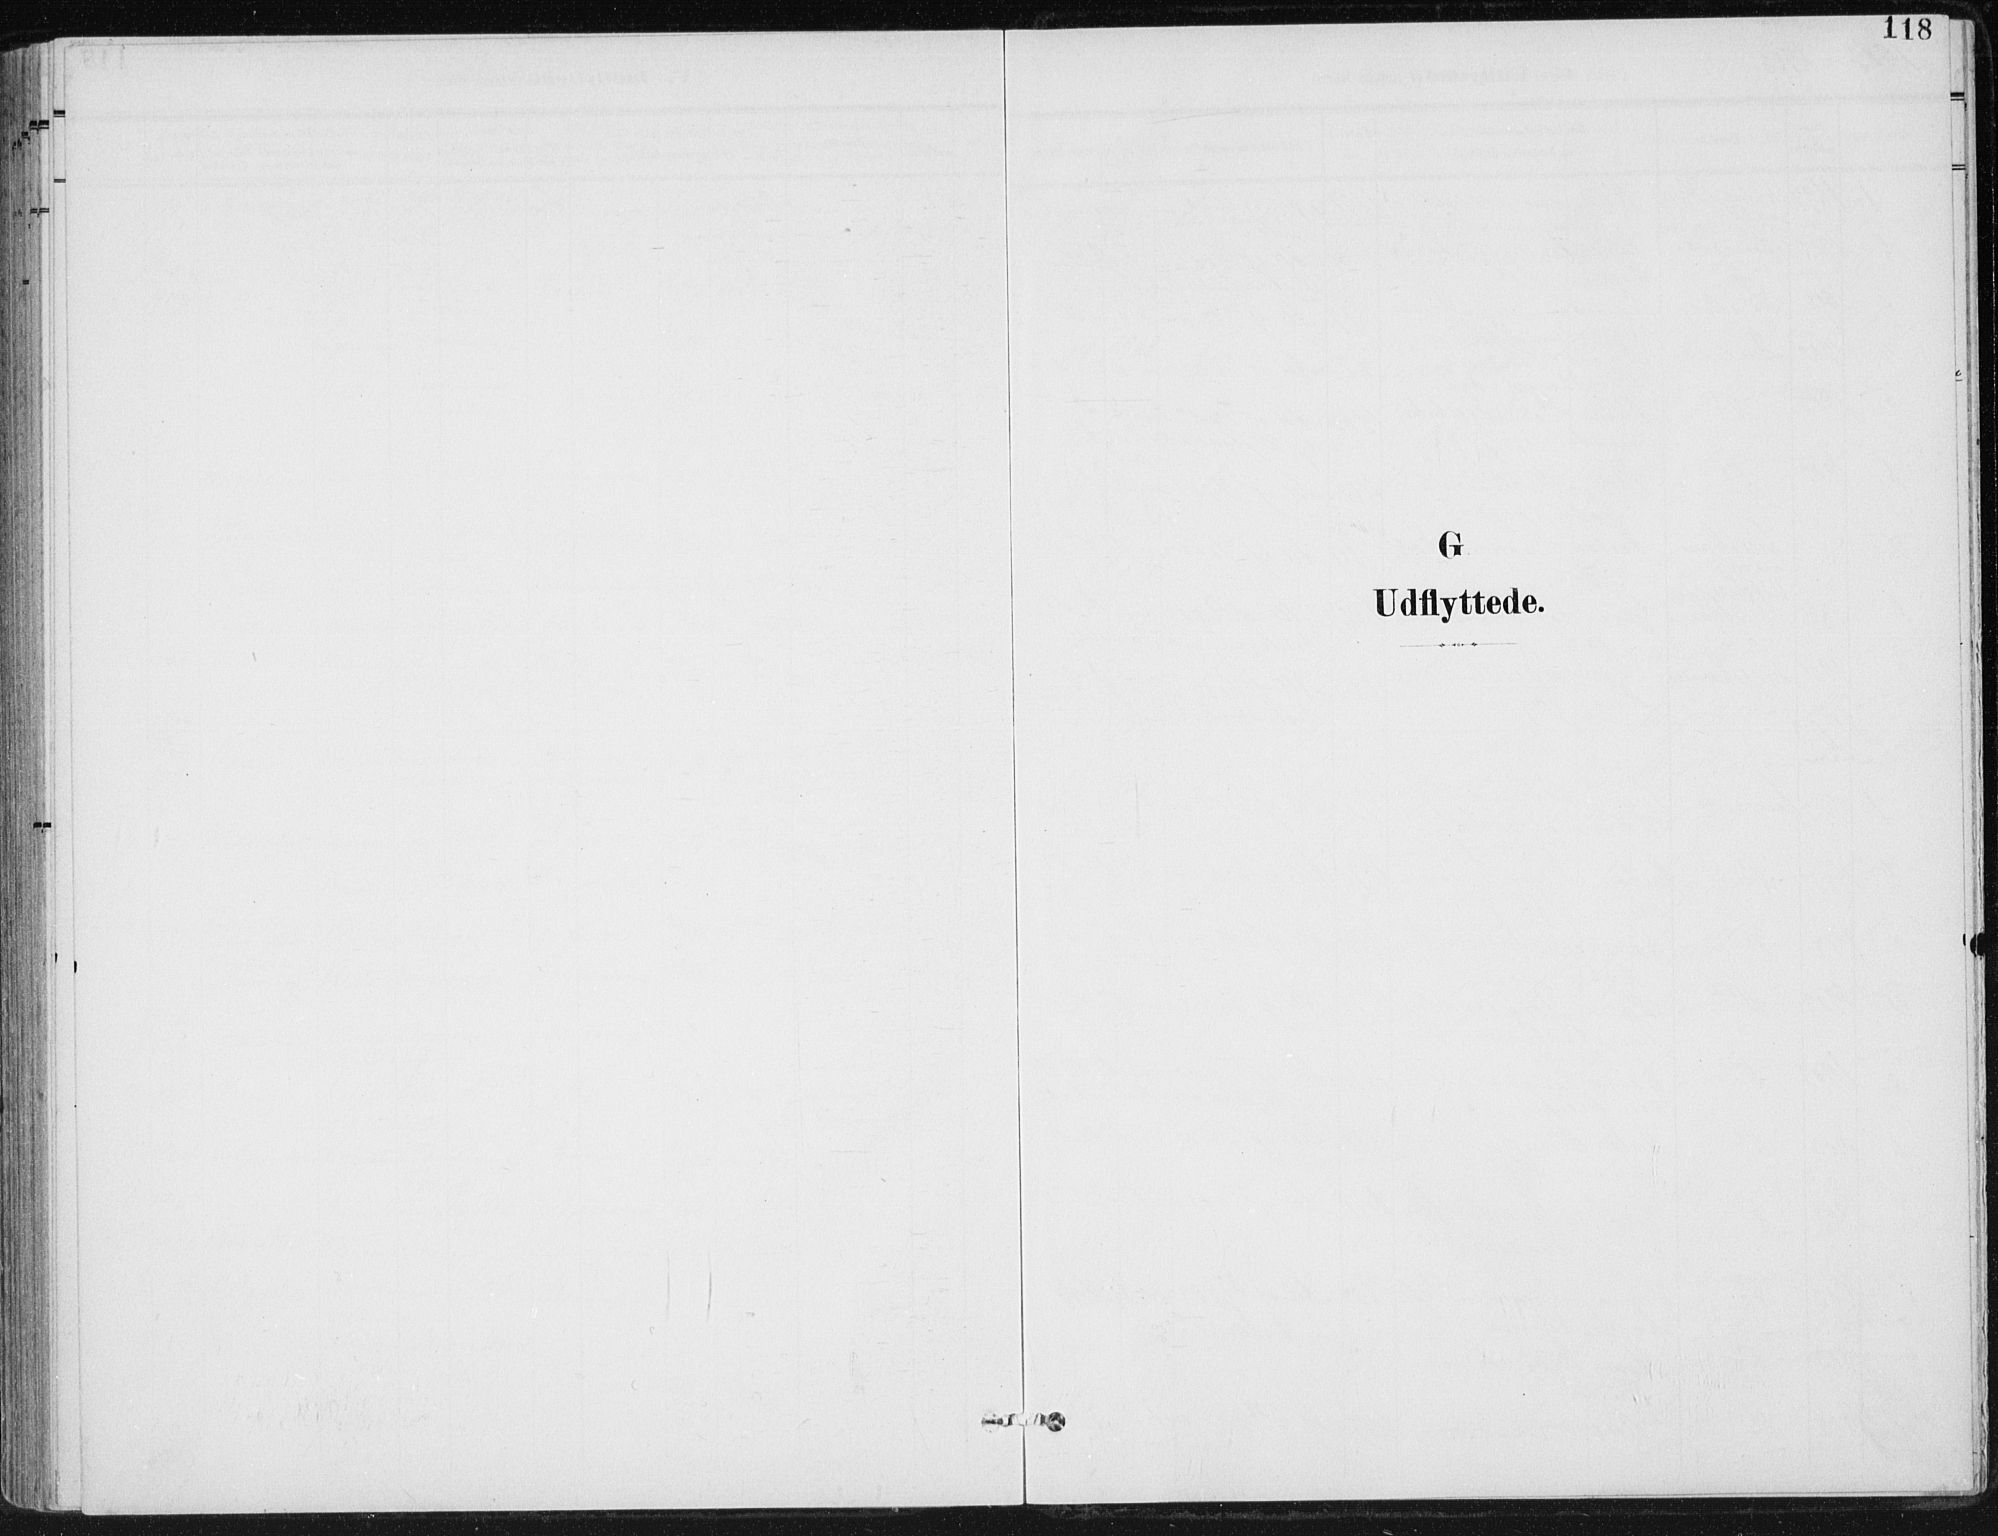 SAH, Østre Gausdal prestekontor, Ministerialbok nr. 5, 1902-1920, s. 118